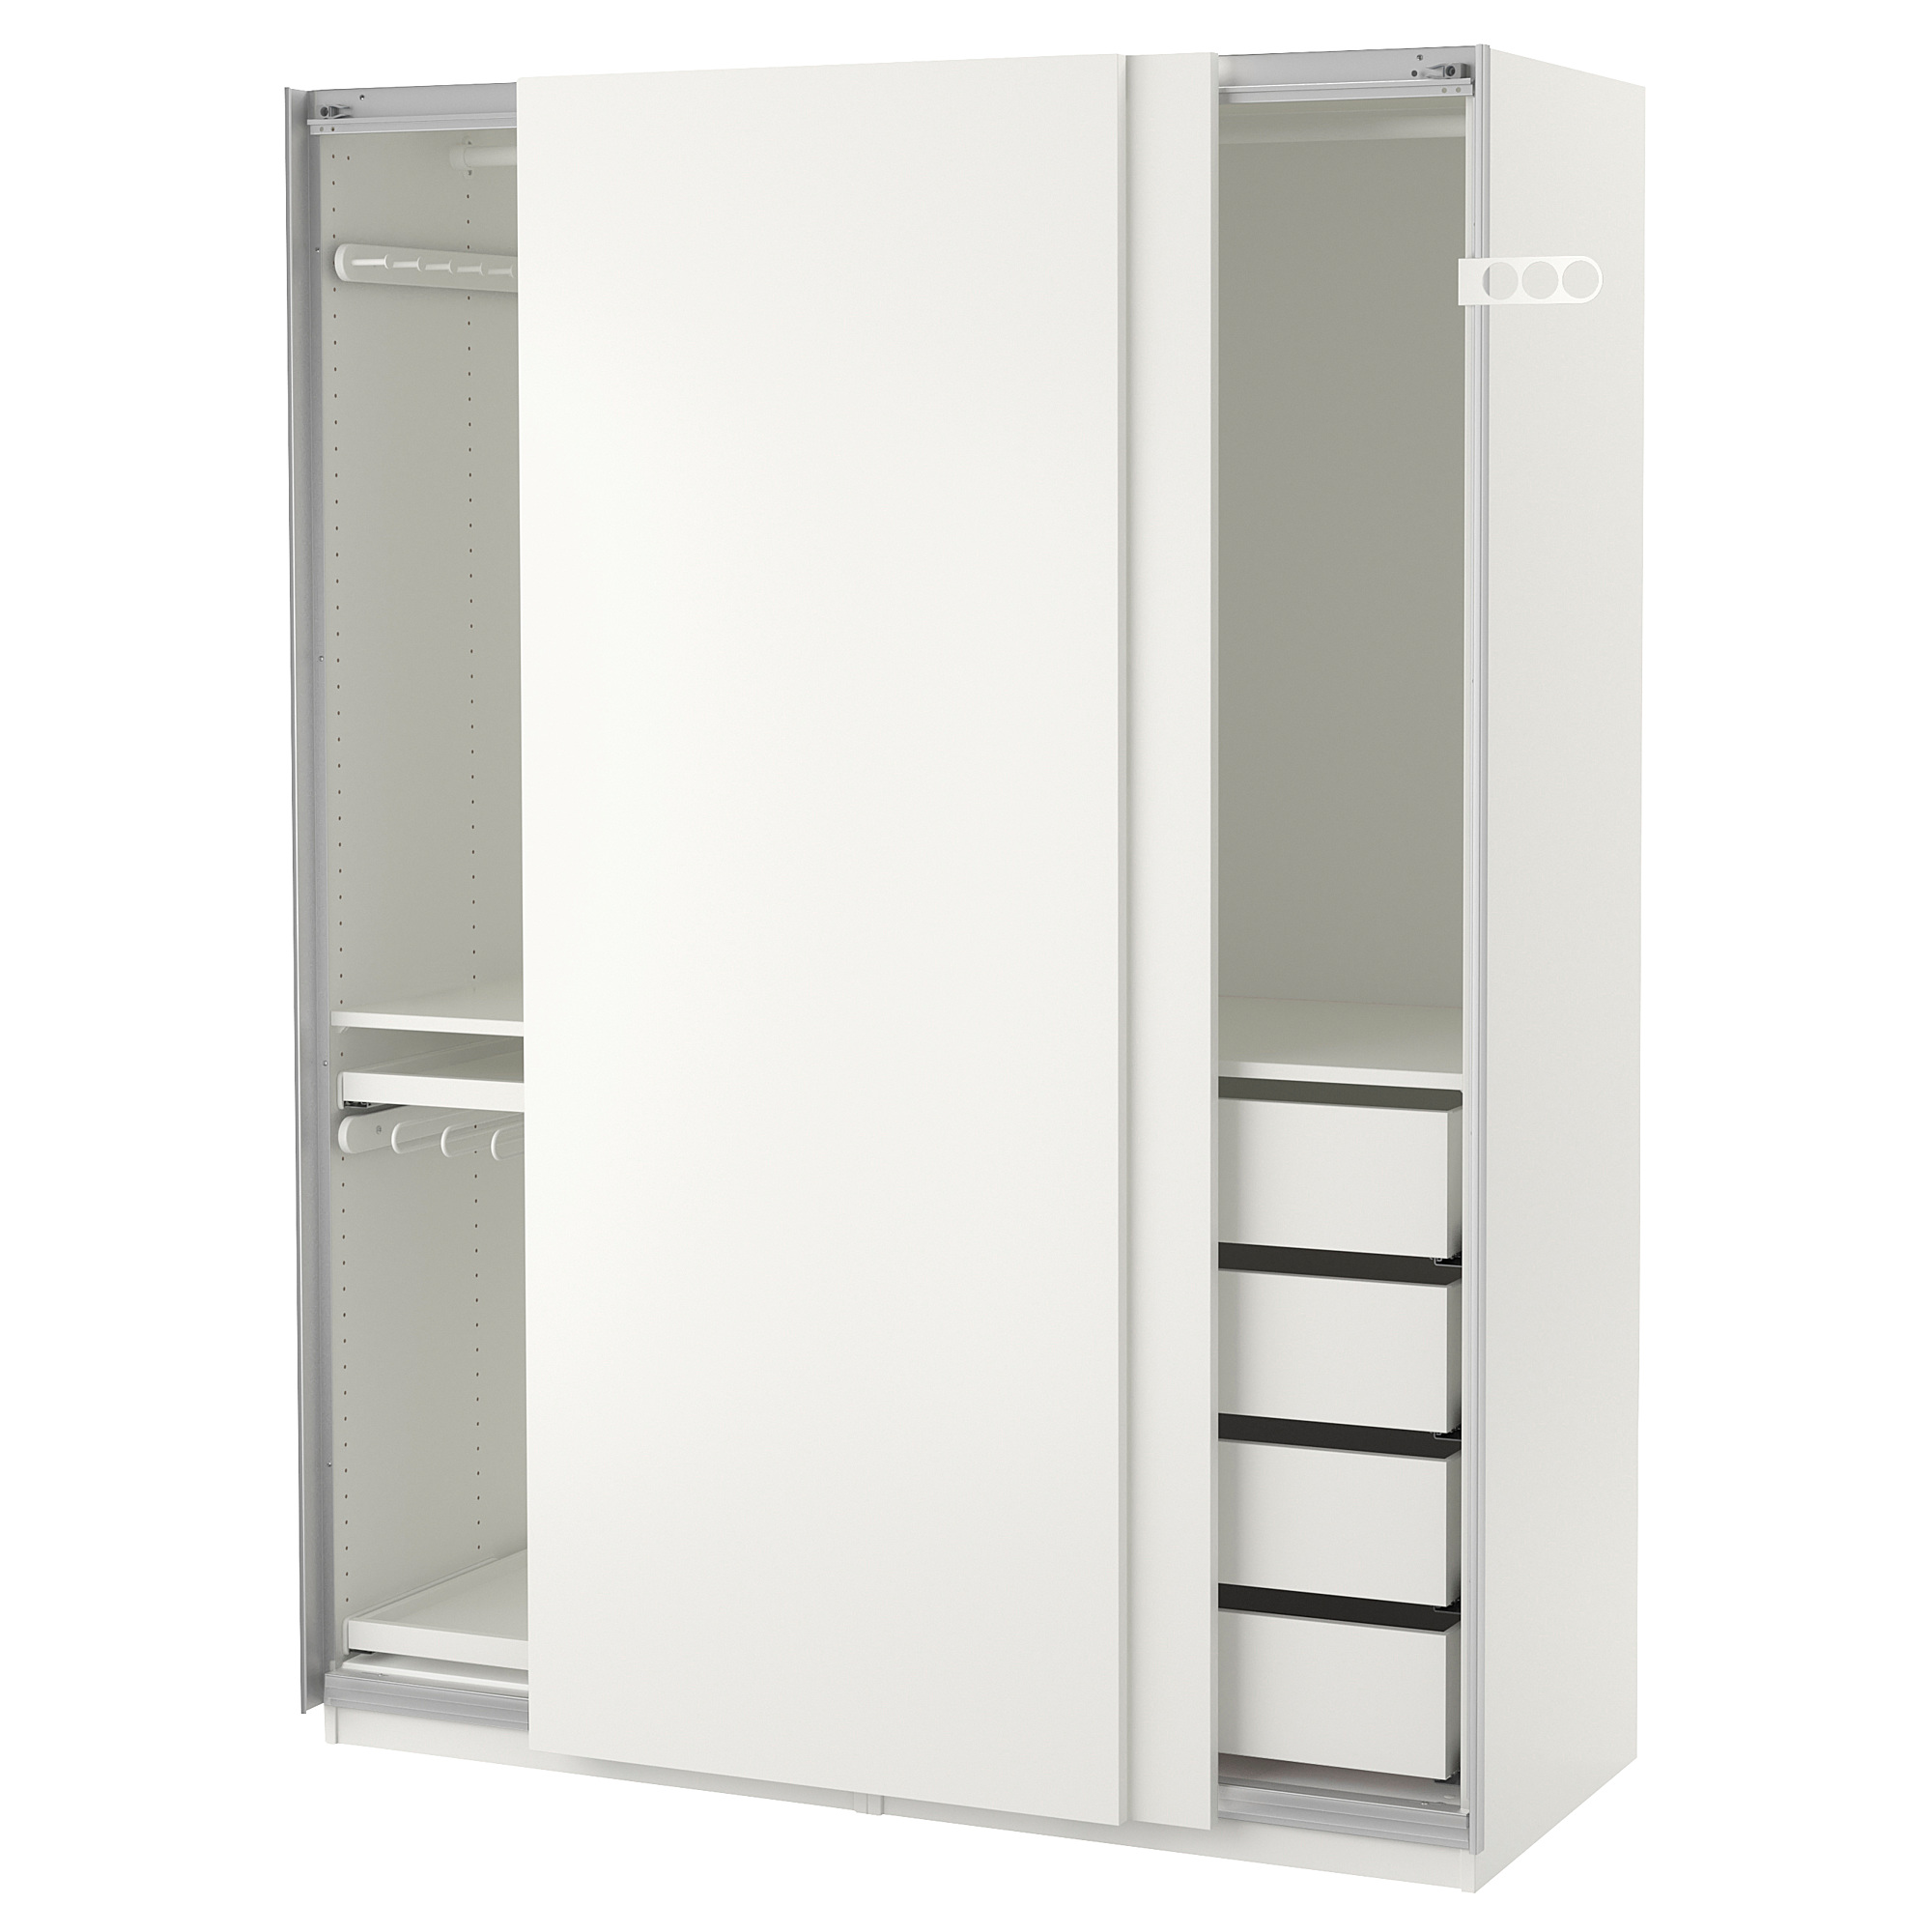 Гардероб ПАКС, белый, Хасвик белый (150x66x201 см)